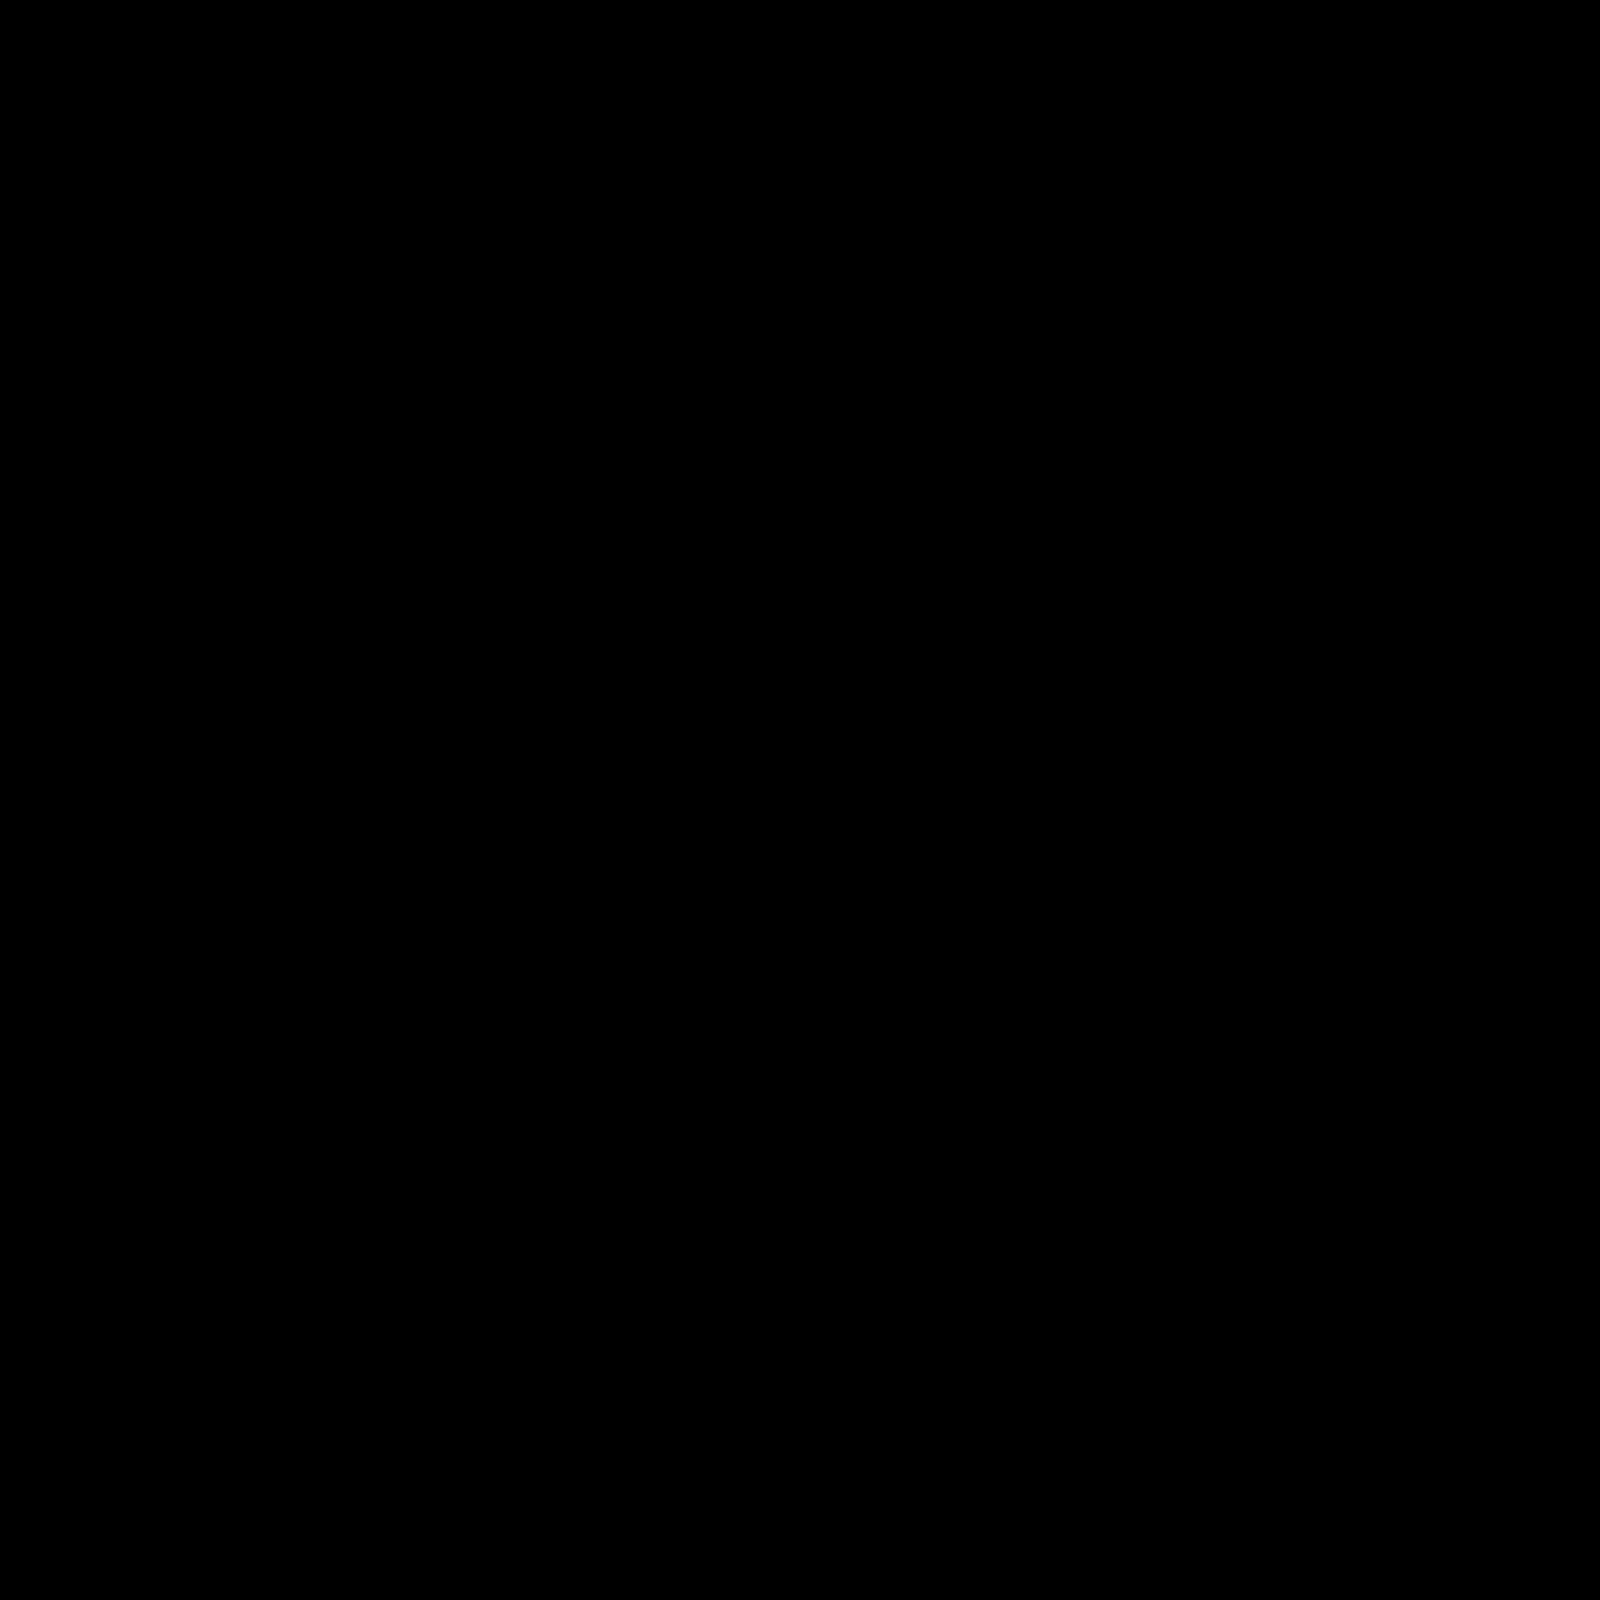 Trilobite Filled icon